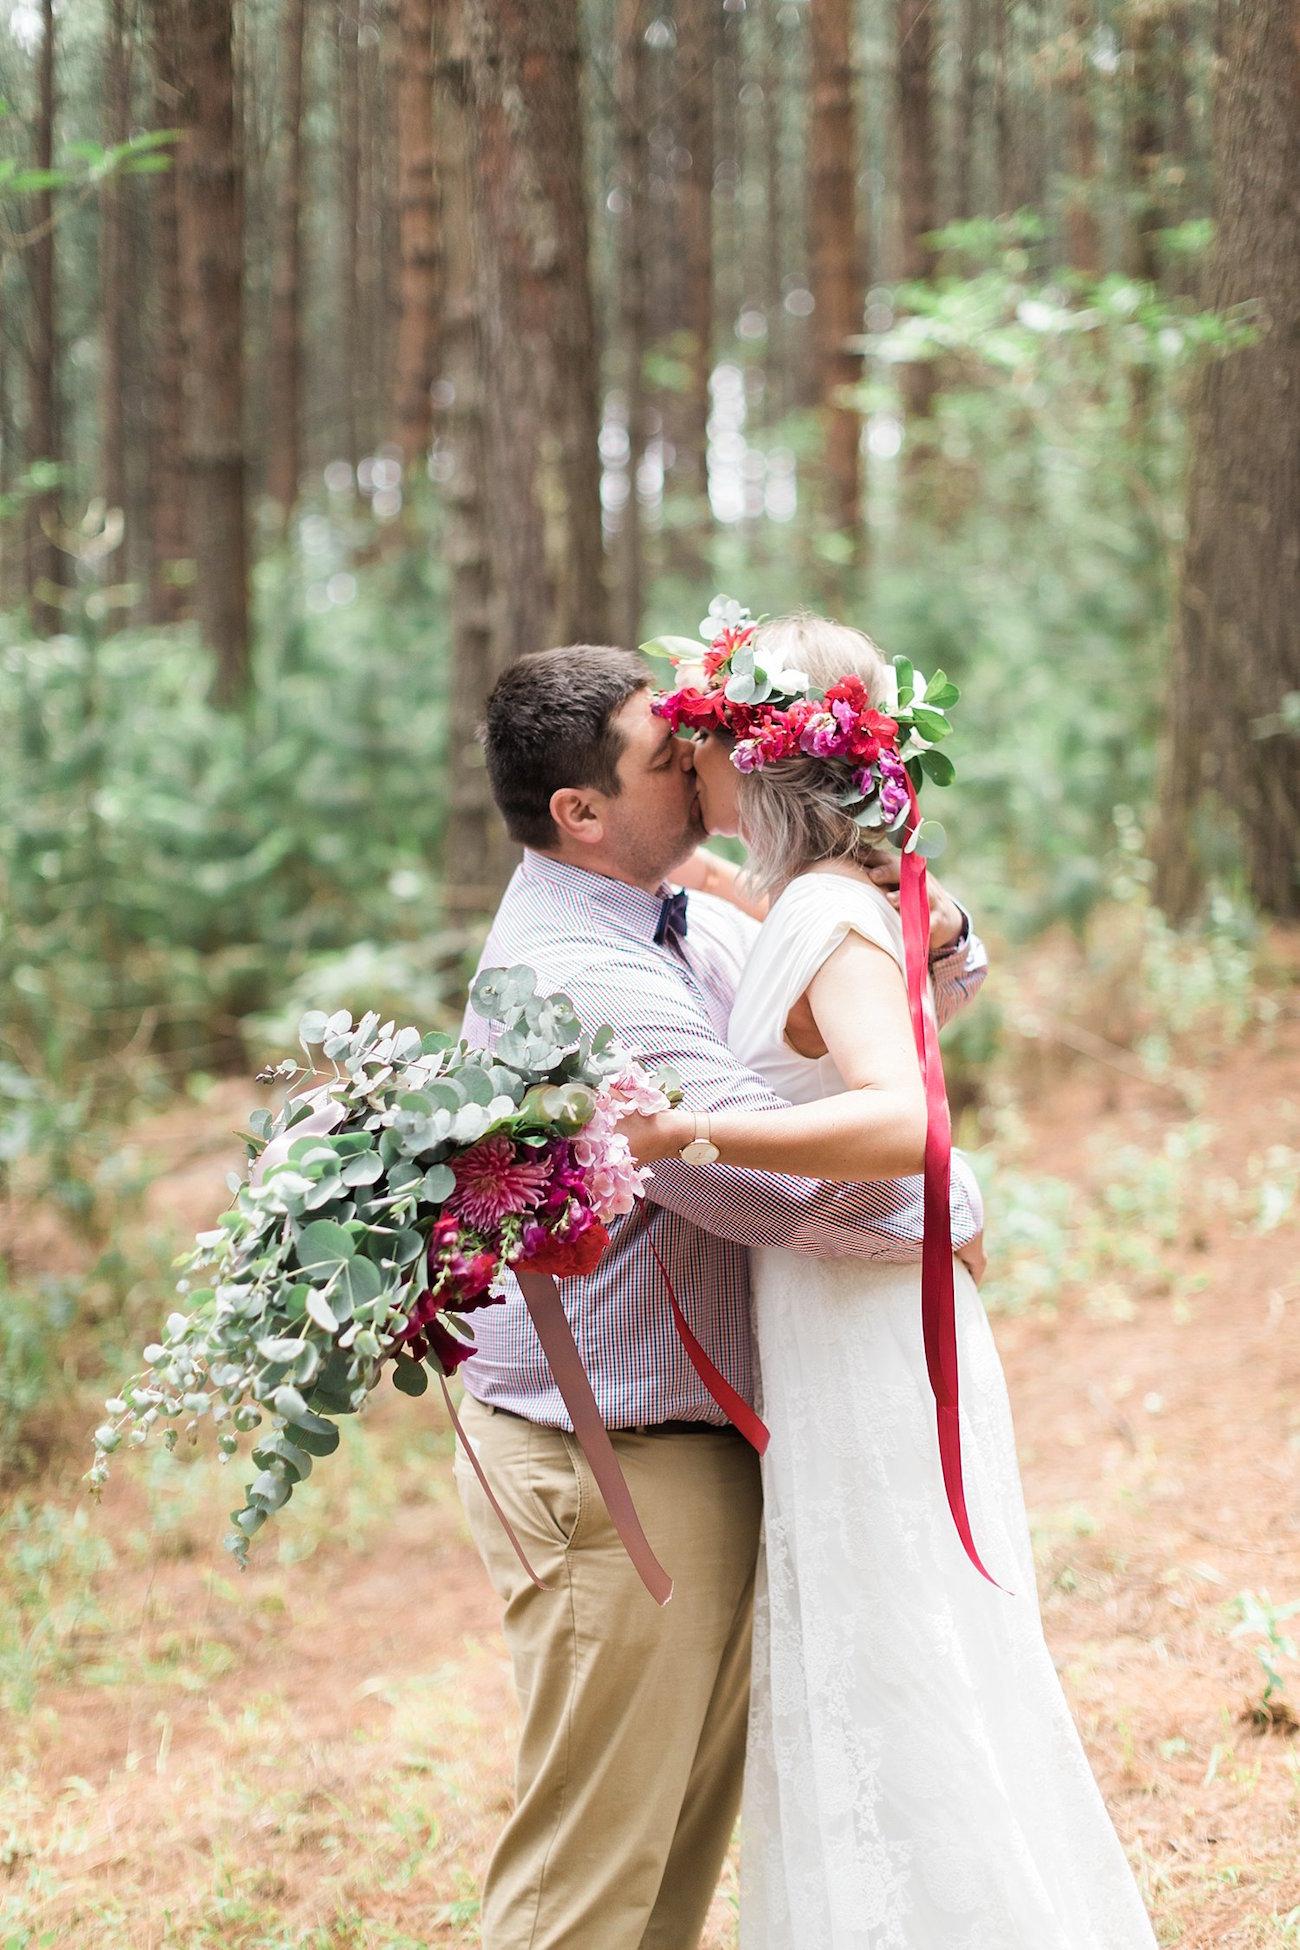 Forest Wedding Ceremony | Image: Alicia Landman